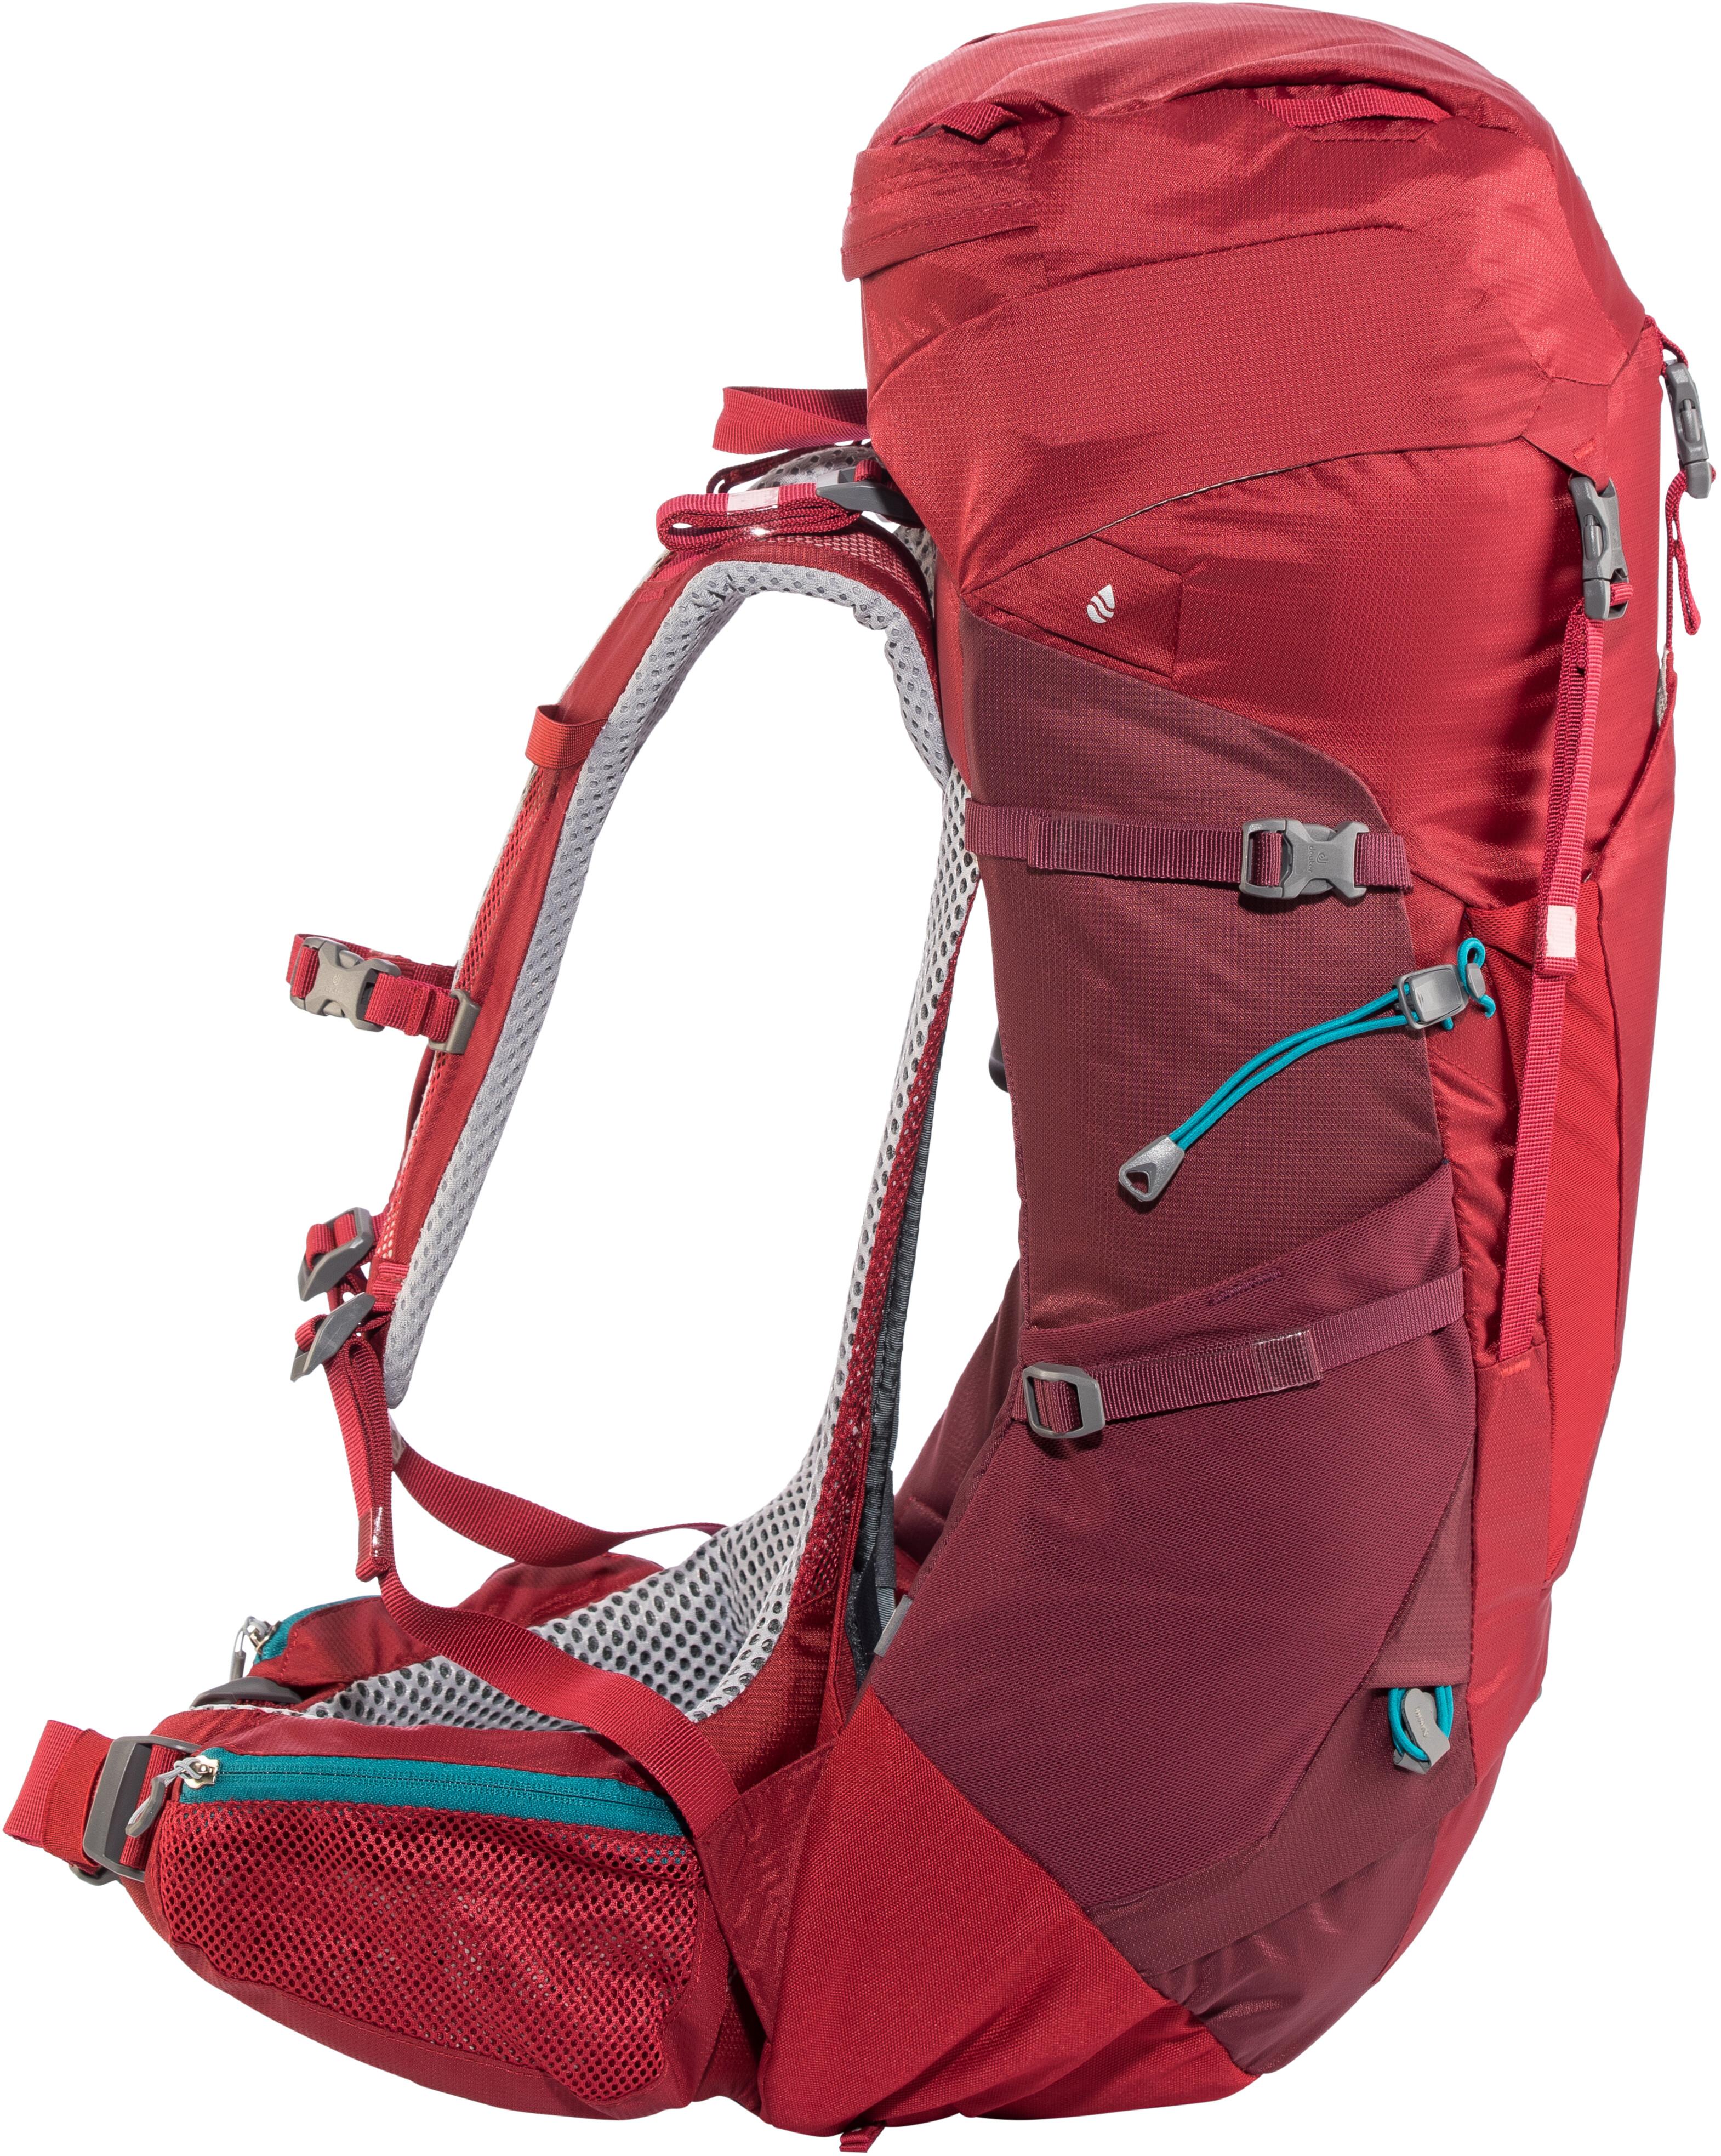 9f2ba193d177d Deuter Futura 28 SL Plecak Kobiety czerwony | Sklep Addnature.pl